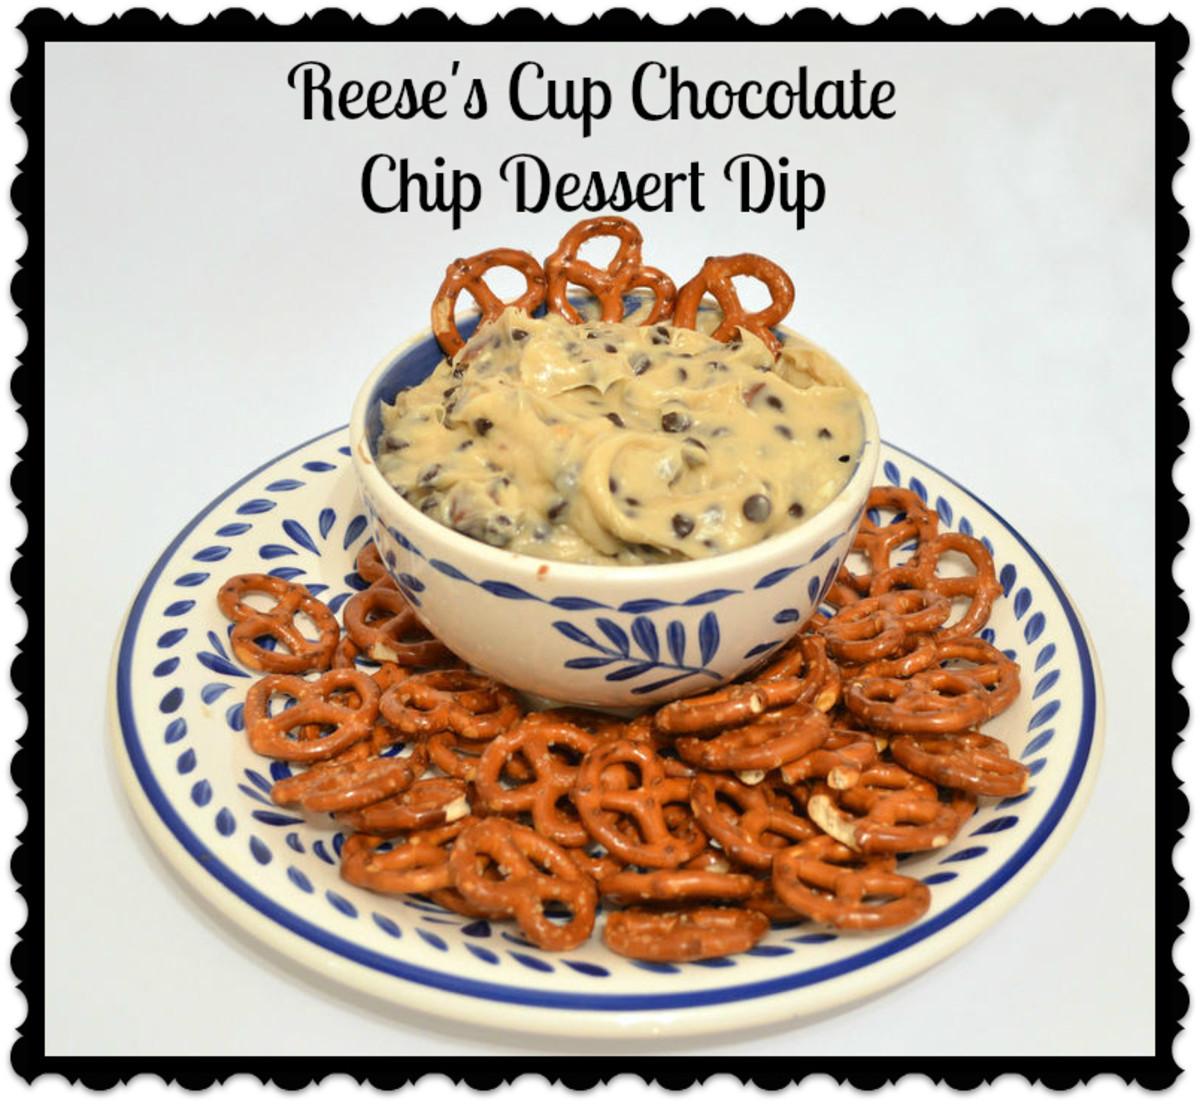 Reese's Peanut Butter Cup Chocolate Chip Cookie Dough Dessert Dip Recipe